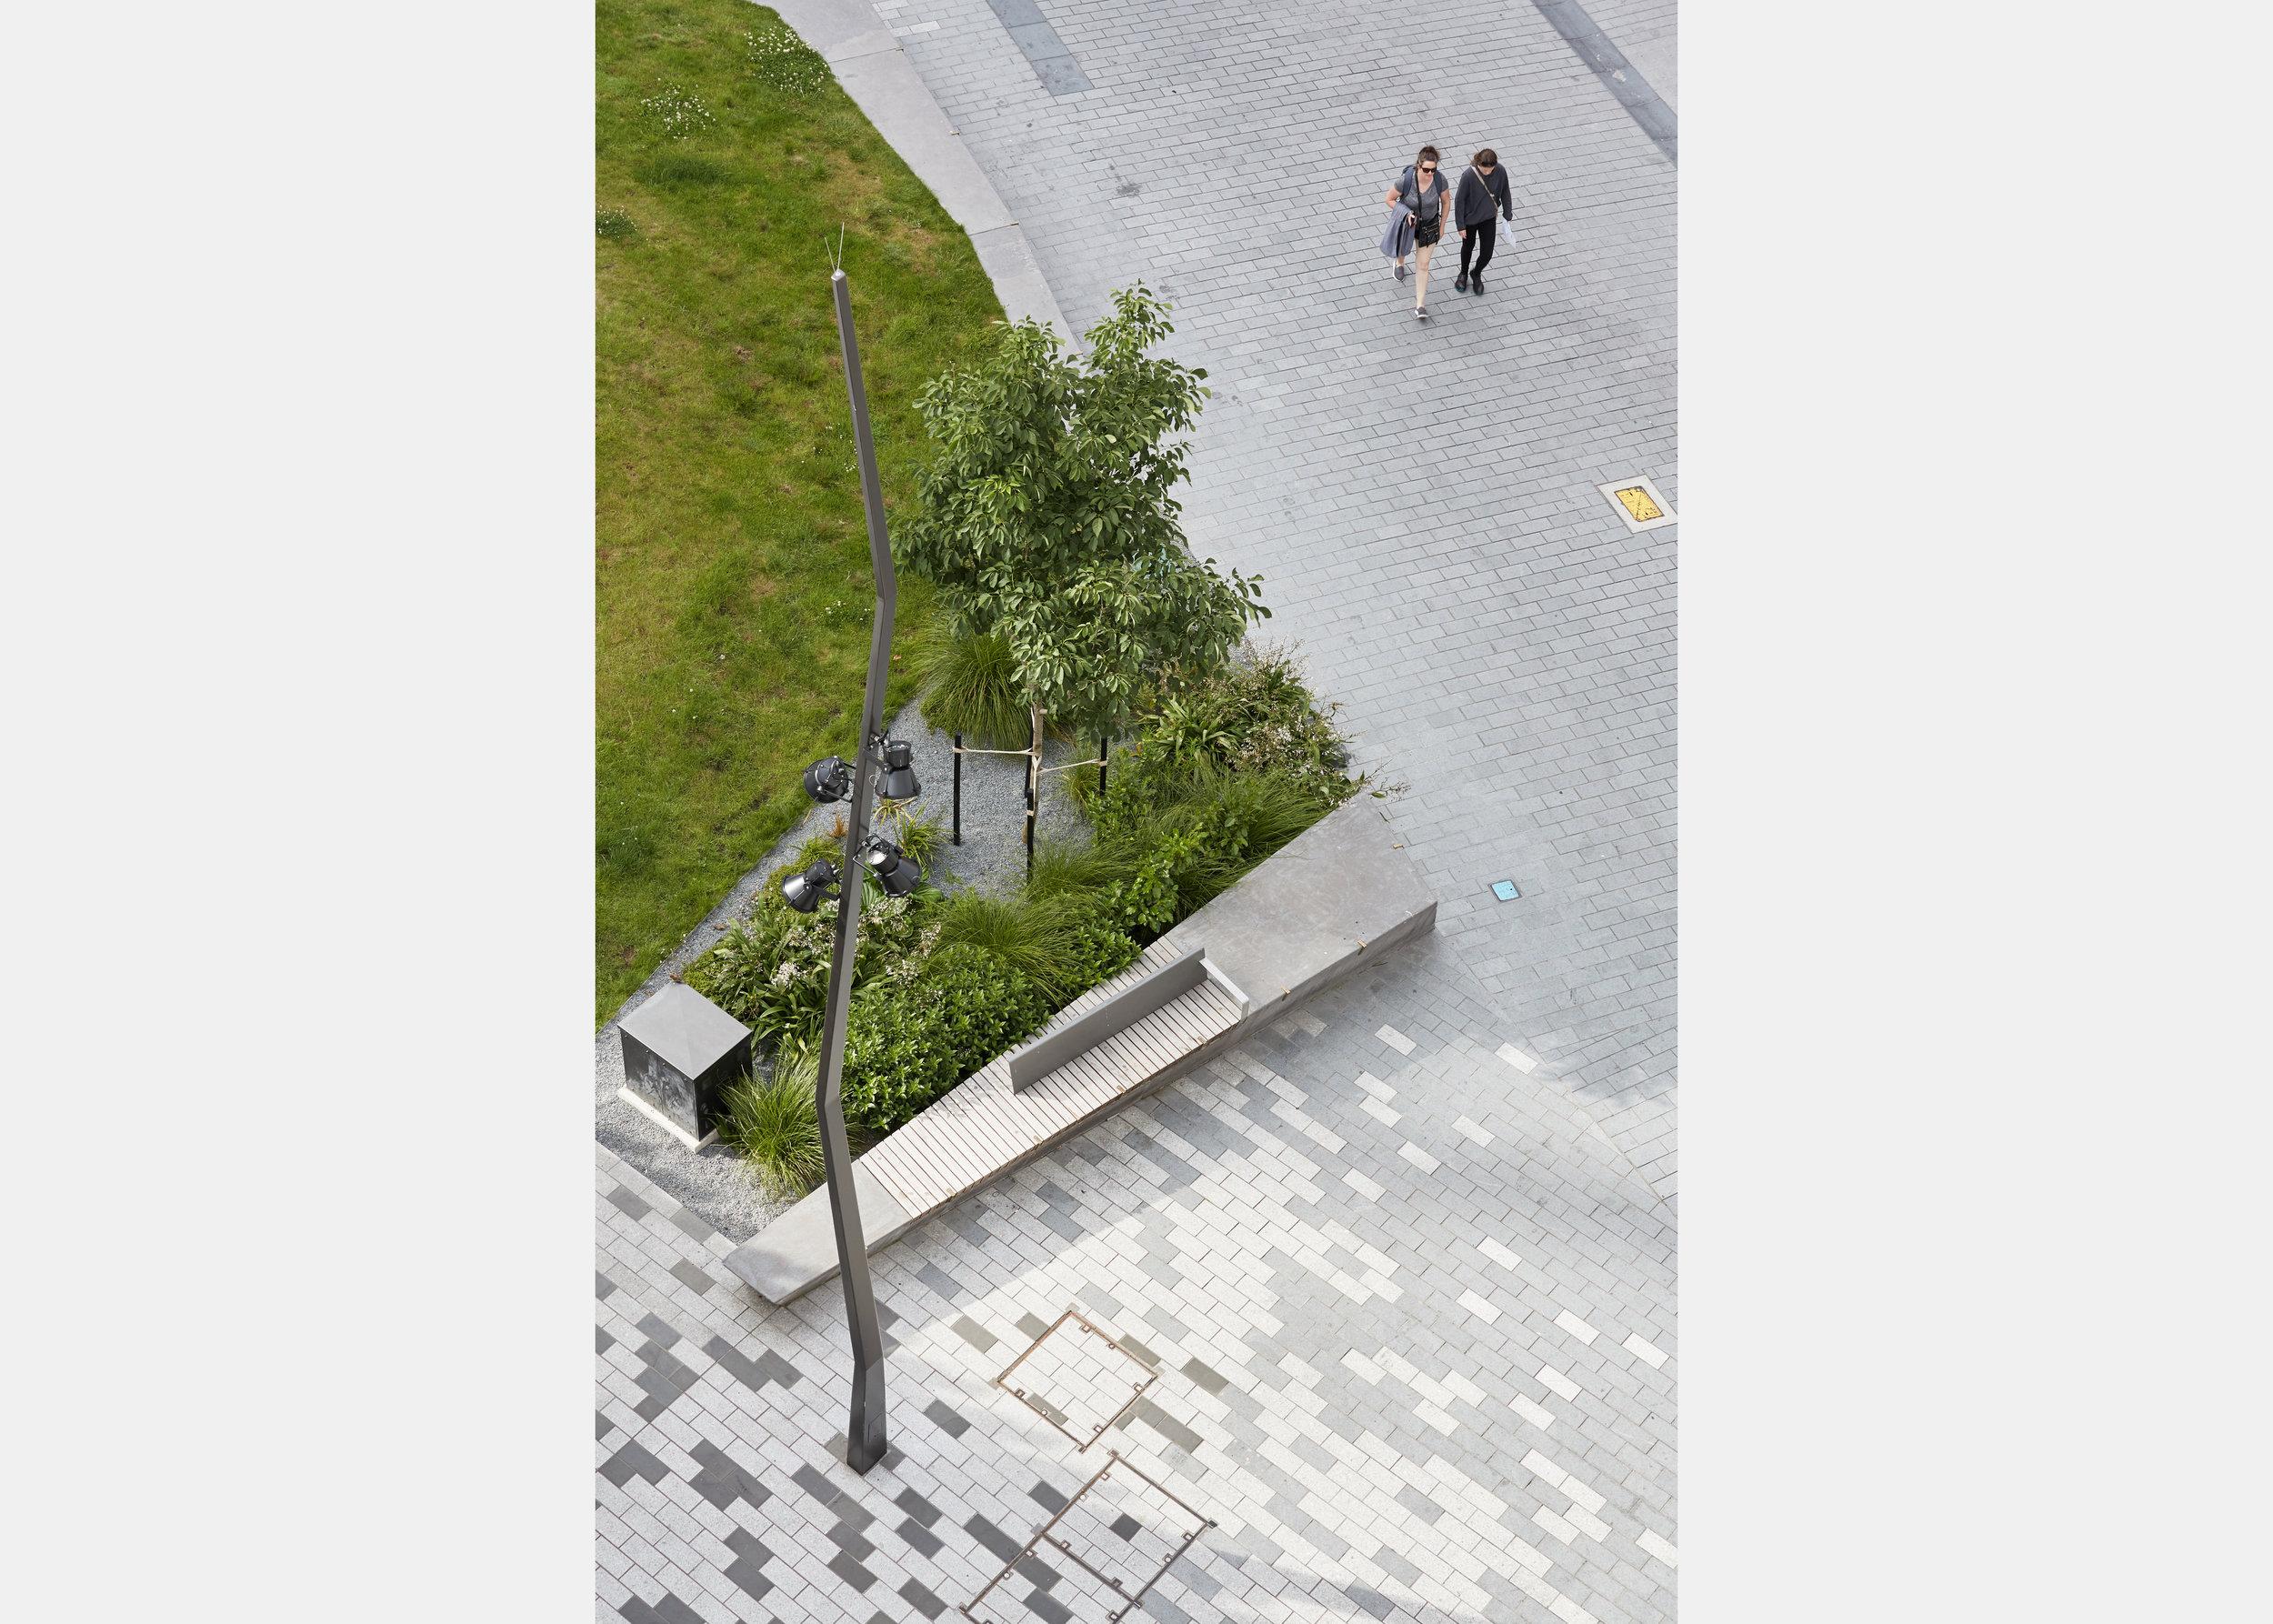 20181209 Lombard Lane Land Lab (unedited) 133.jpg